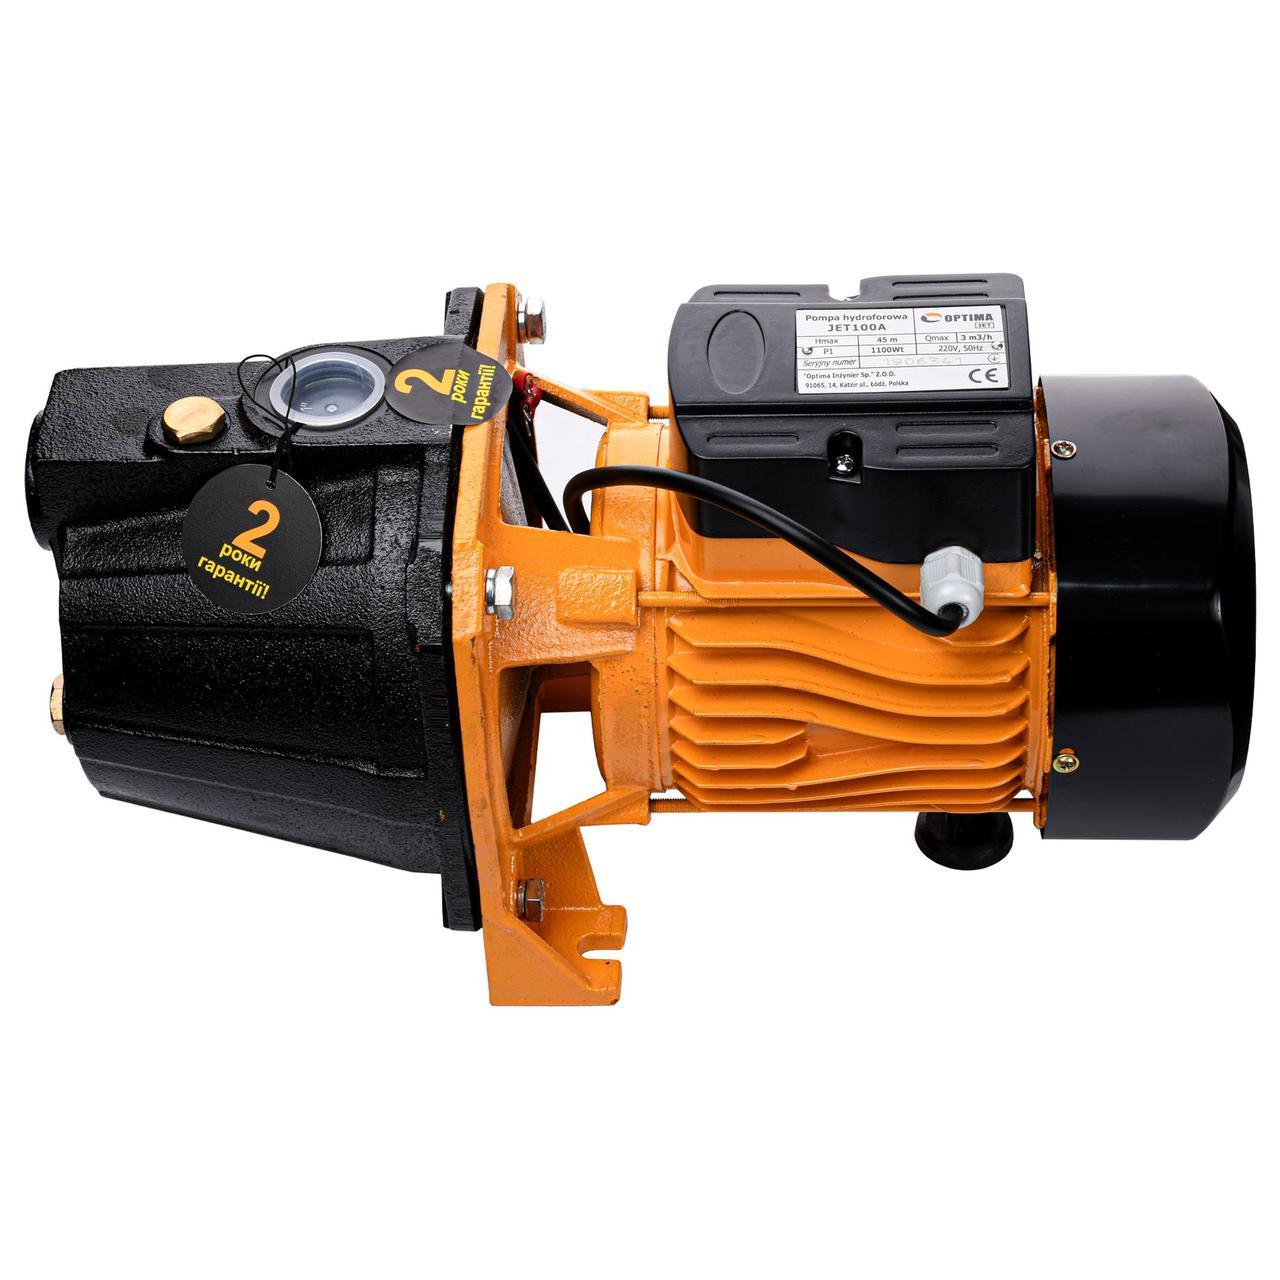 Насос центробежный Optima JET100A 1,1 кВт чугун короткий